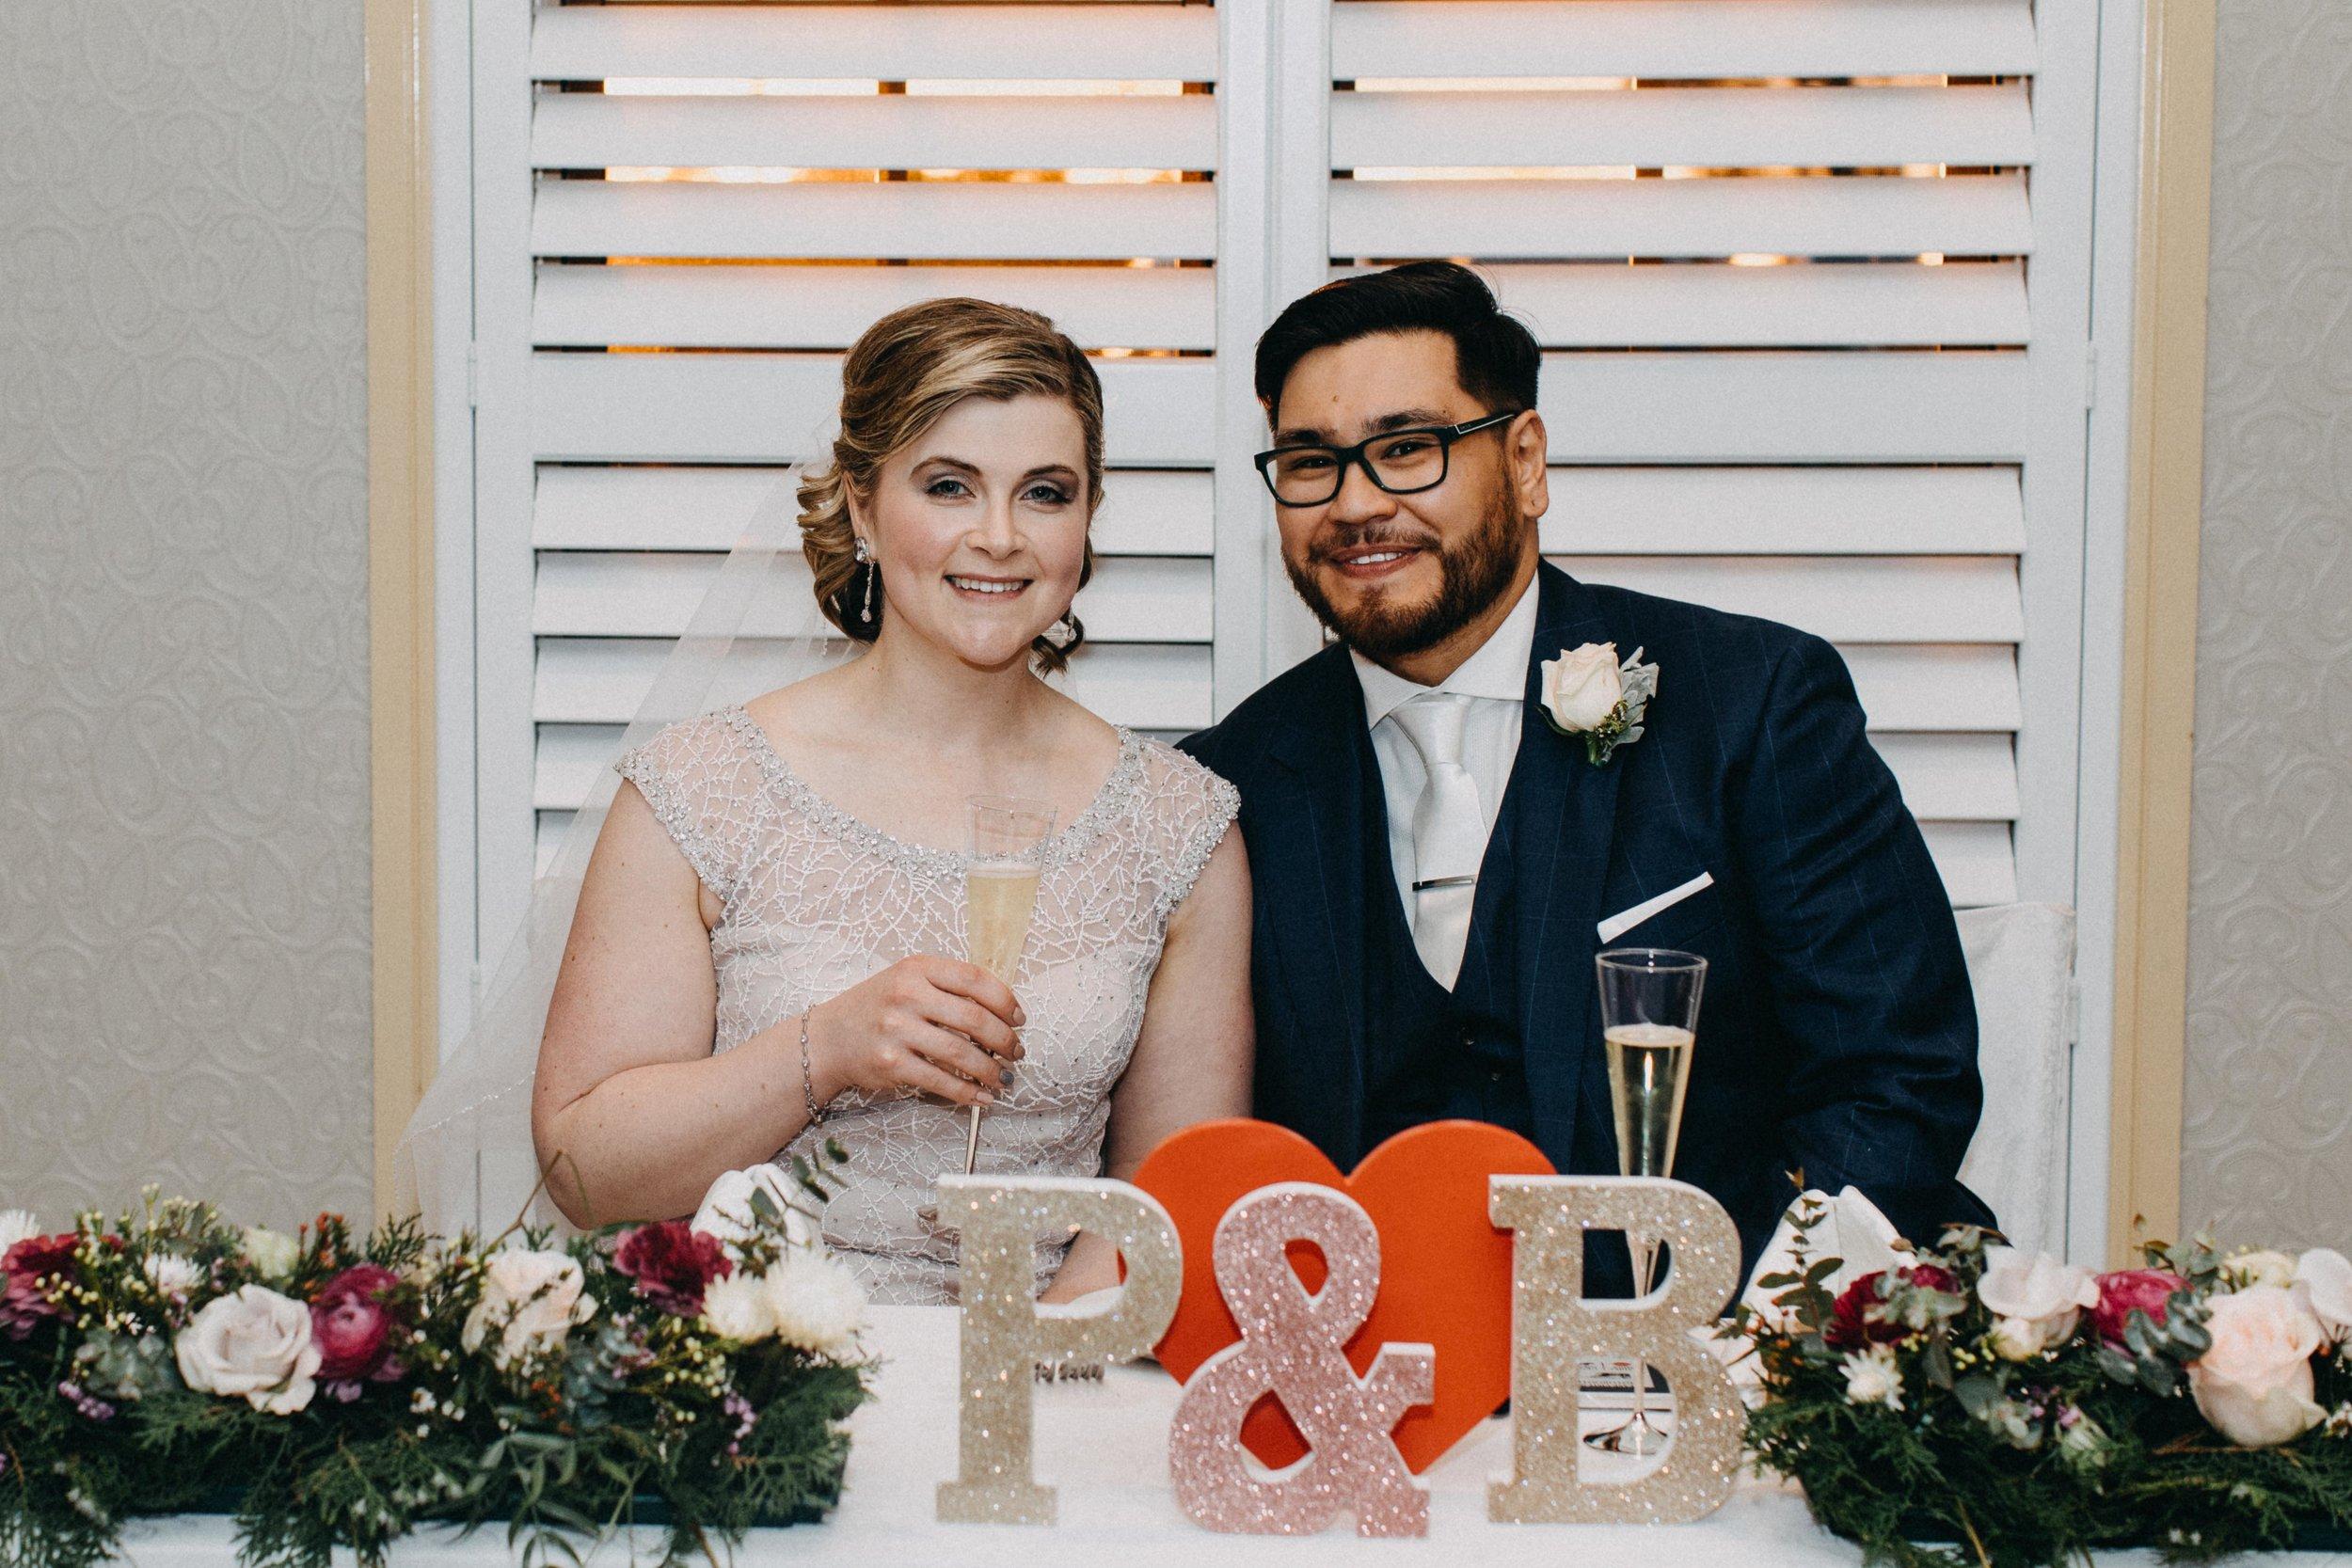 appin-house-wedding-macarthur-www.emilyobrienphotography.net-147.jpg